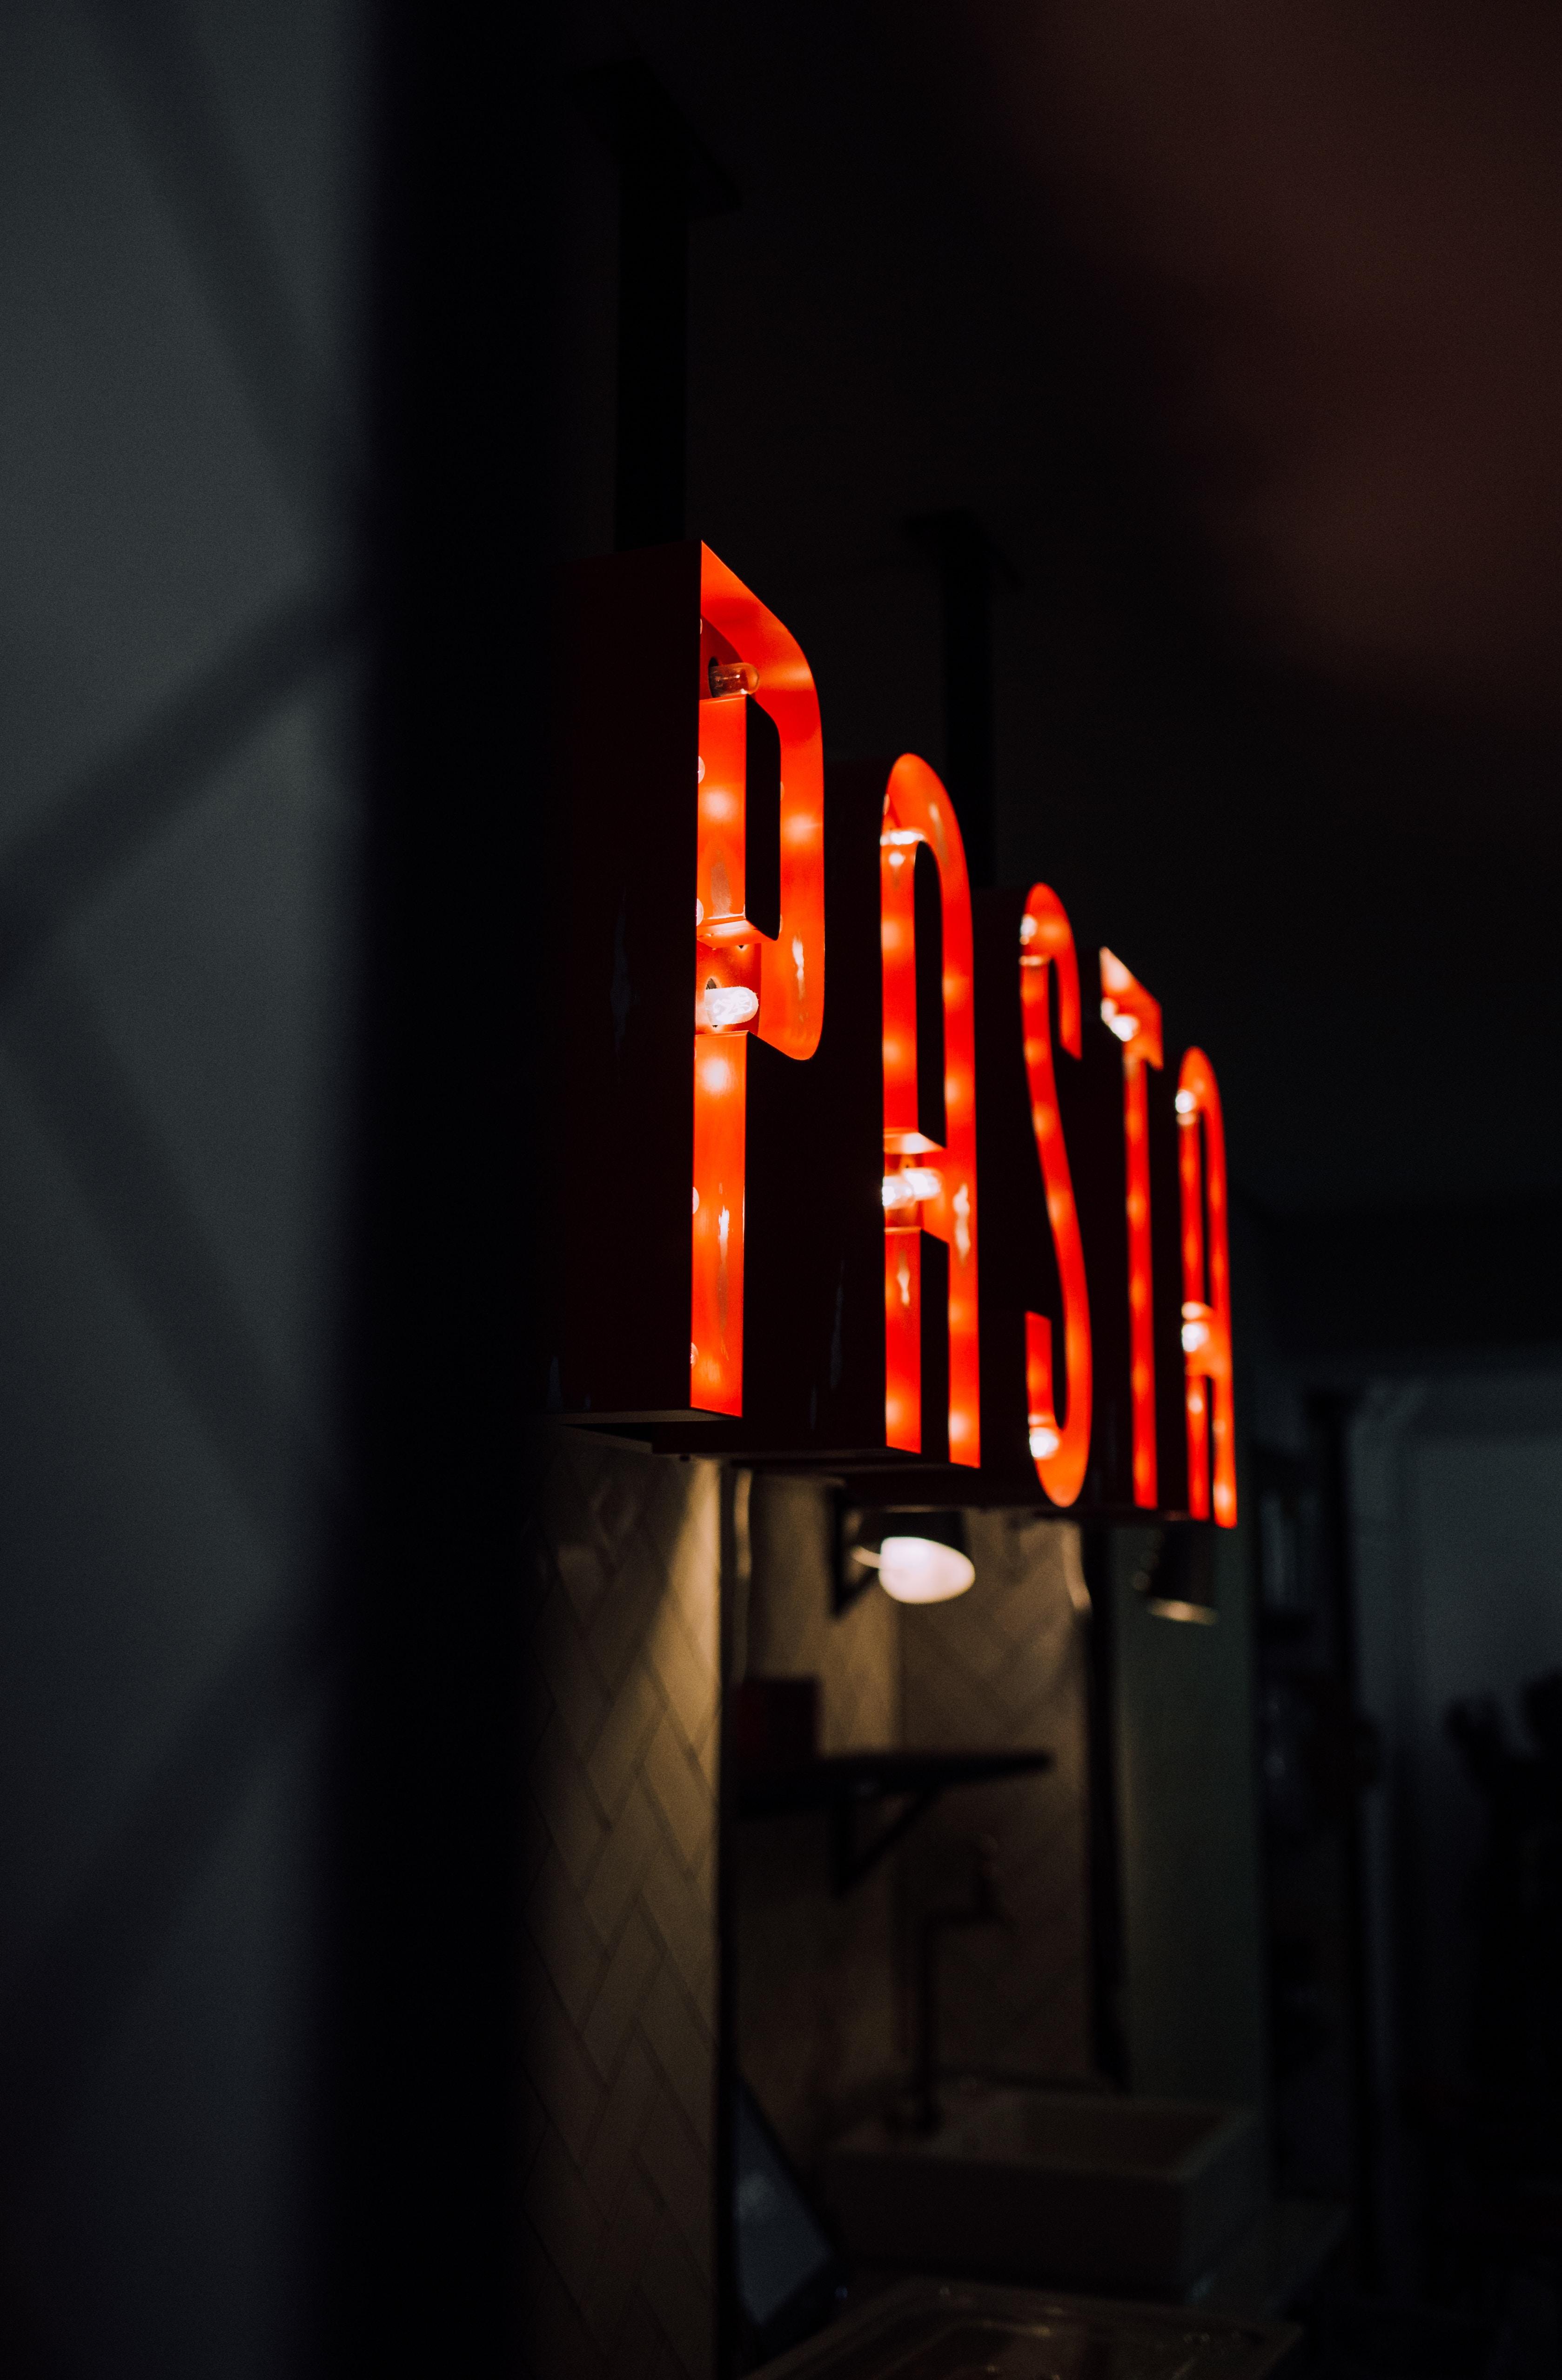 red Pasta light signage